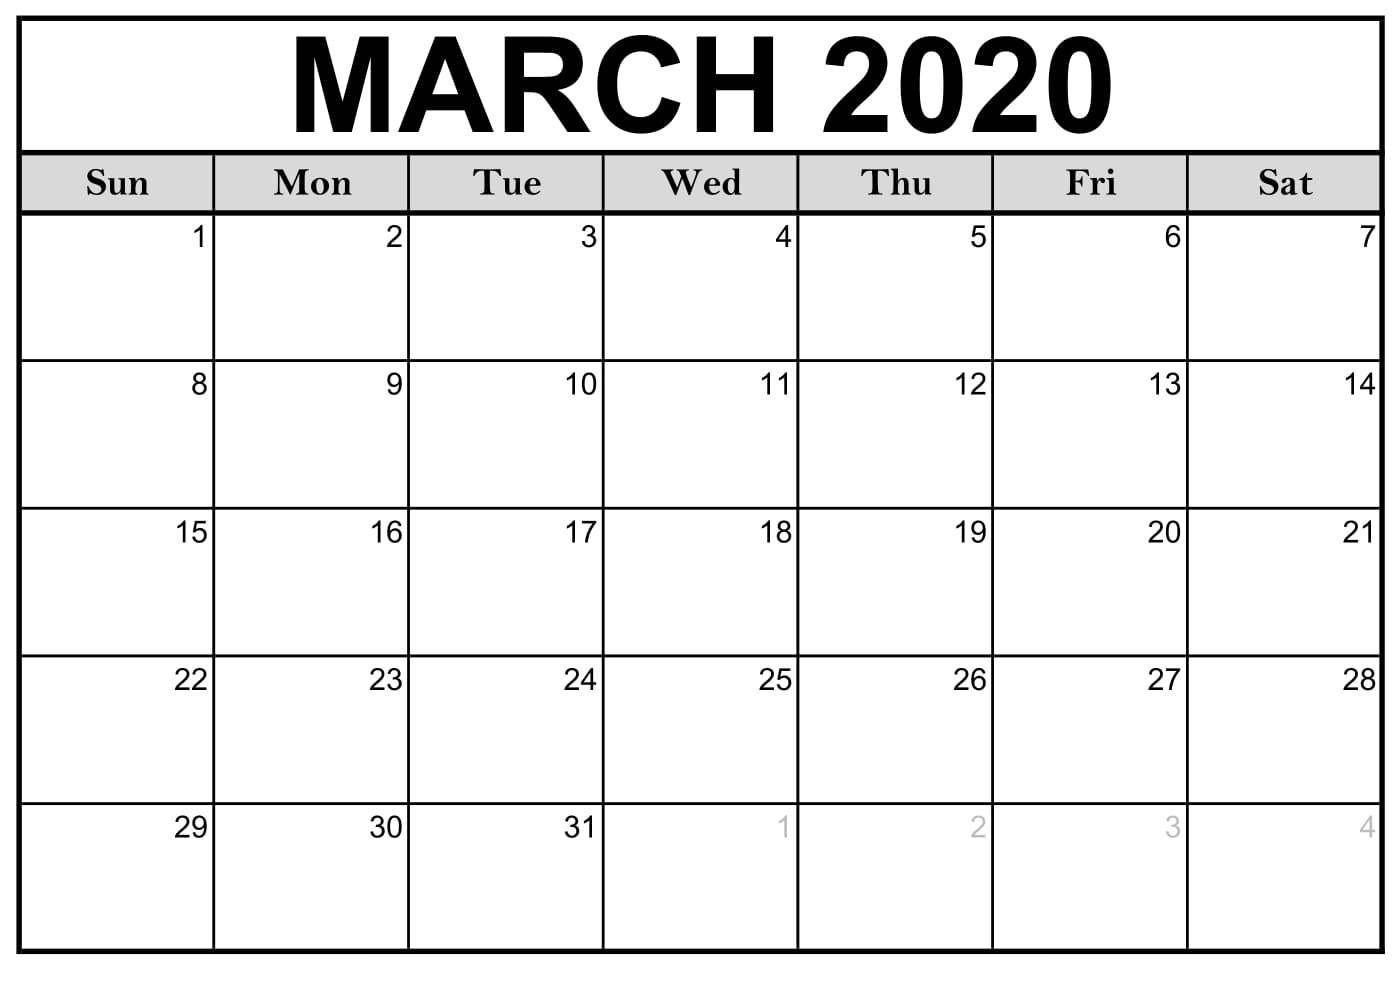 Fillable March 2020 Calendar Template Word, Pdf, Excel  Free Printable Editable Calendars 2020